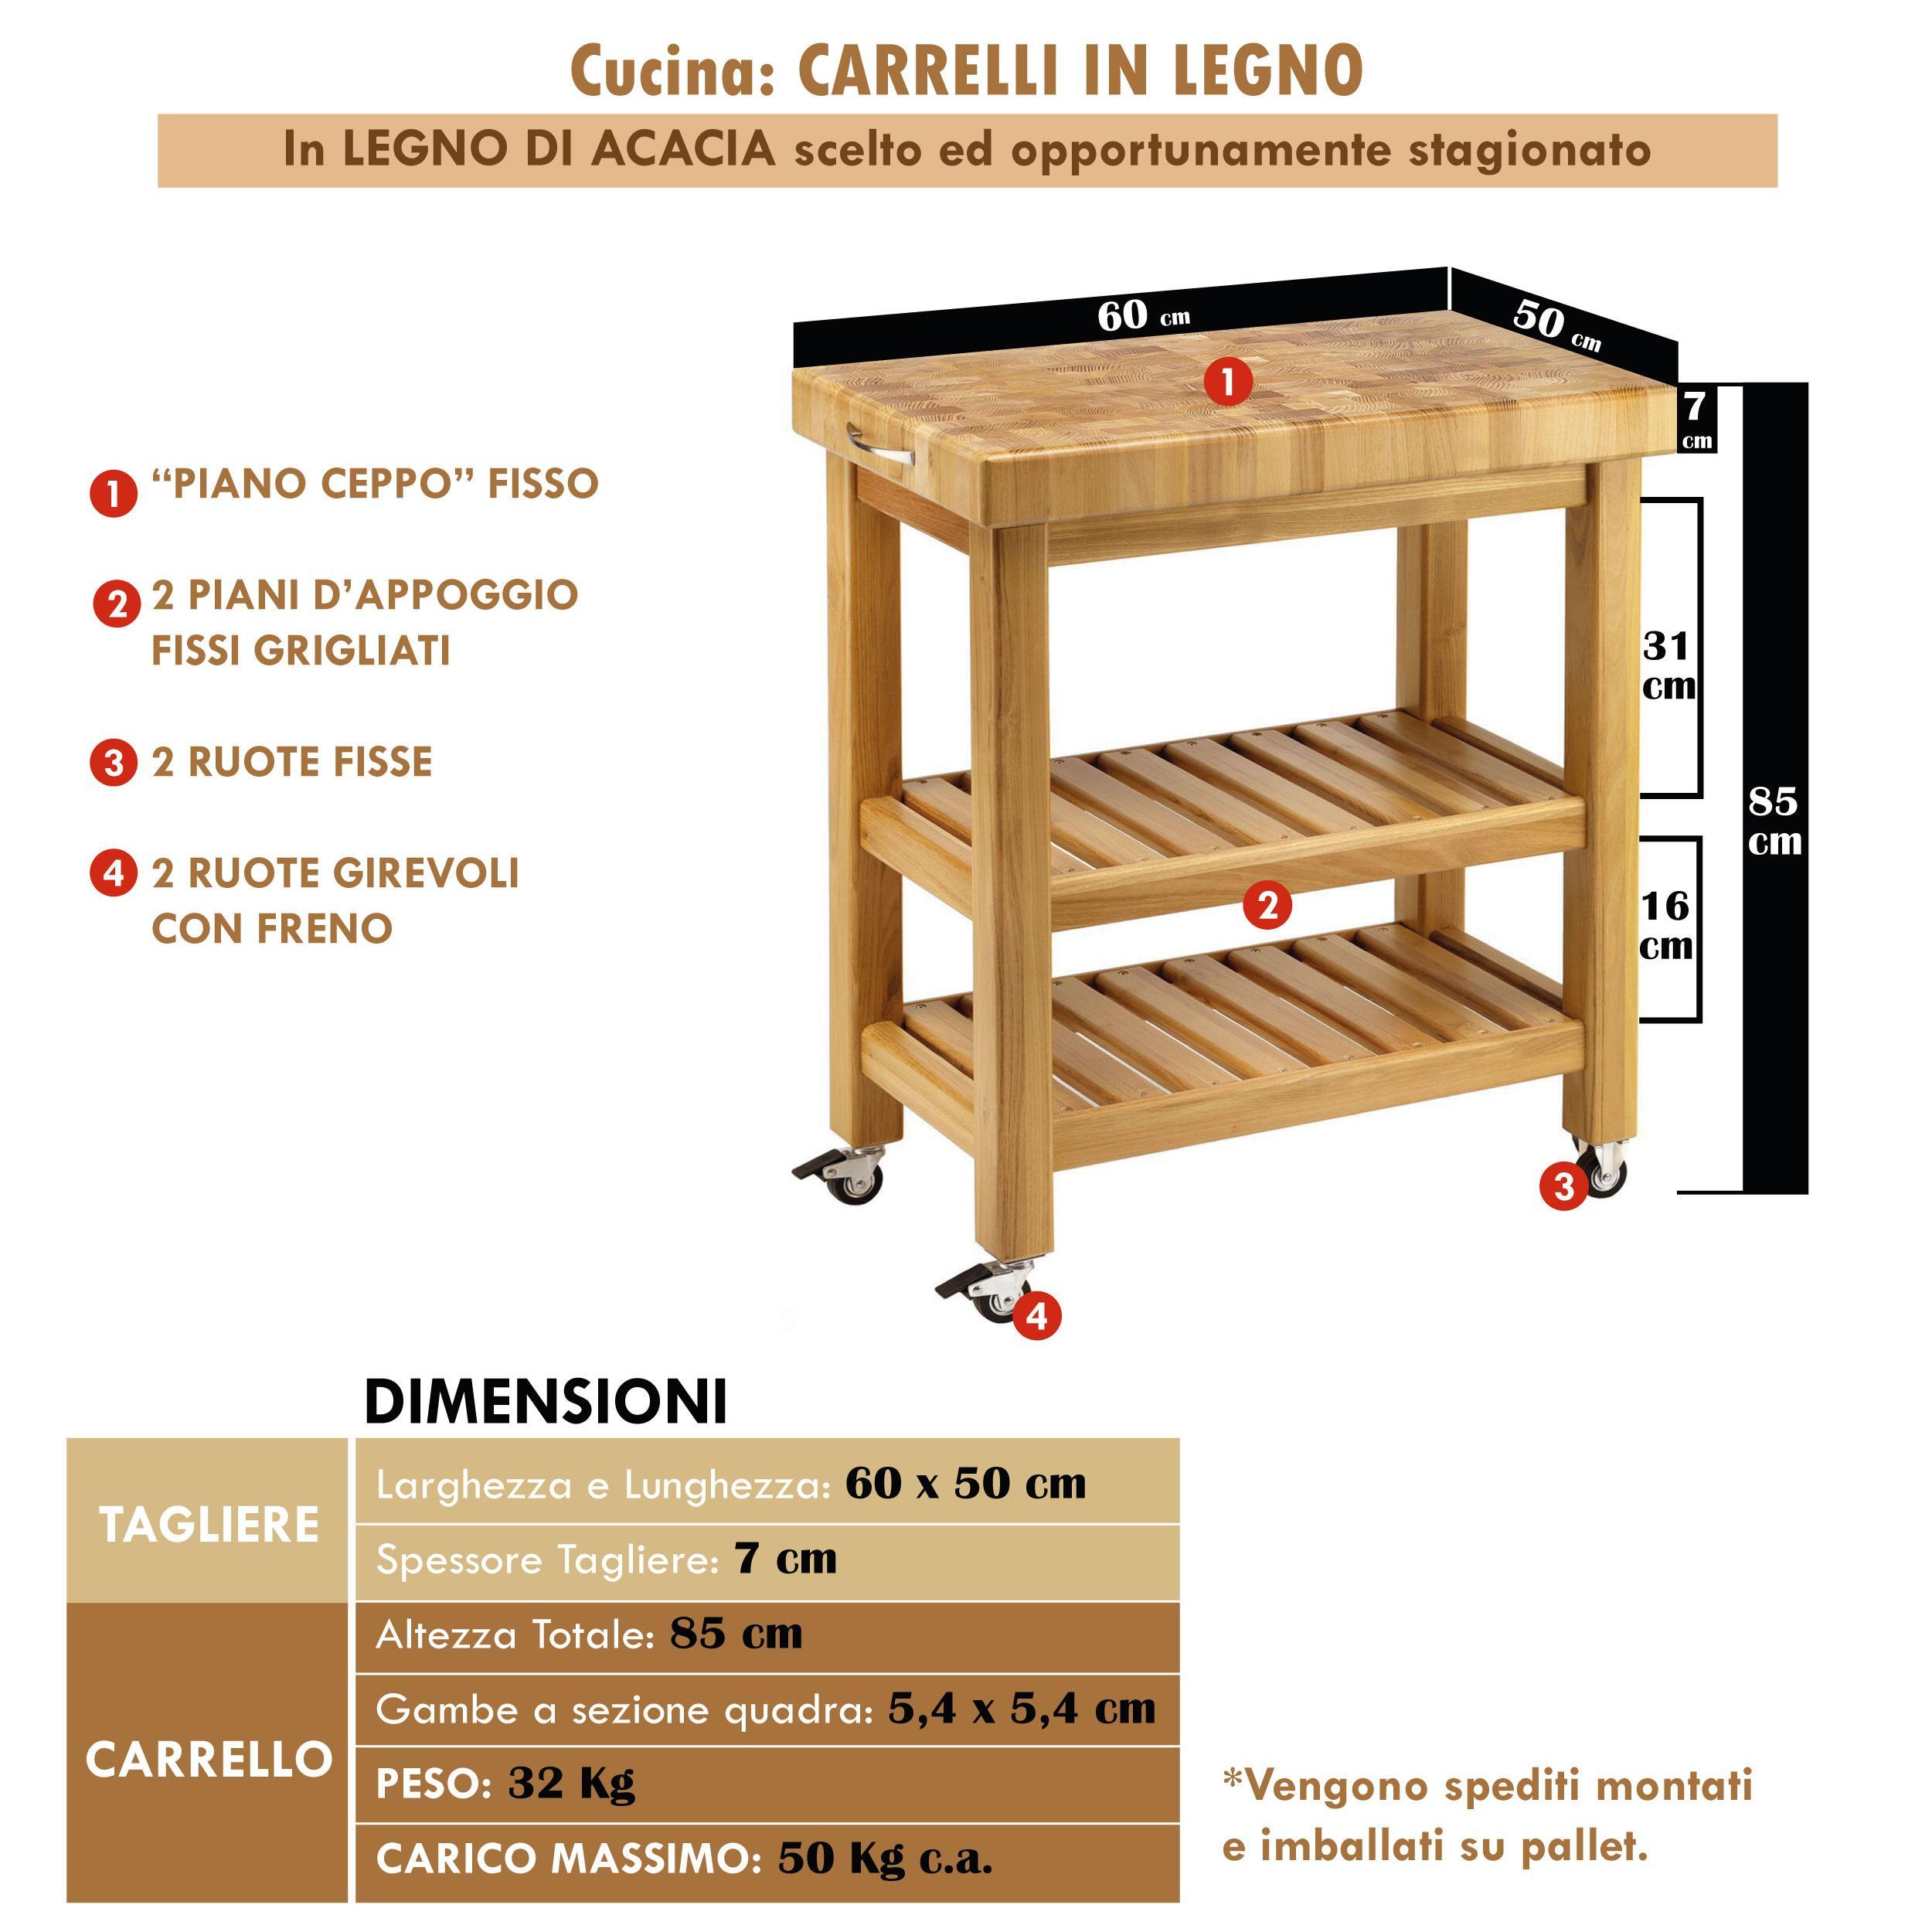 Carrelli Per Cucina Ikea - Interno Di Casa - Smepool.com